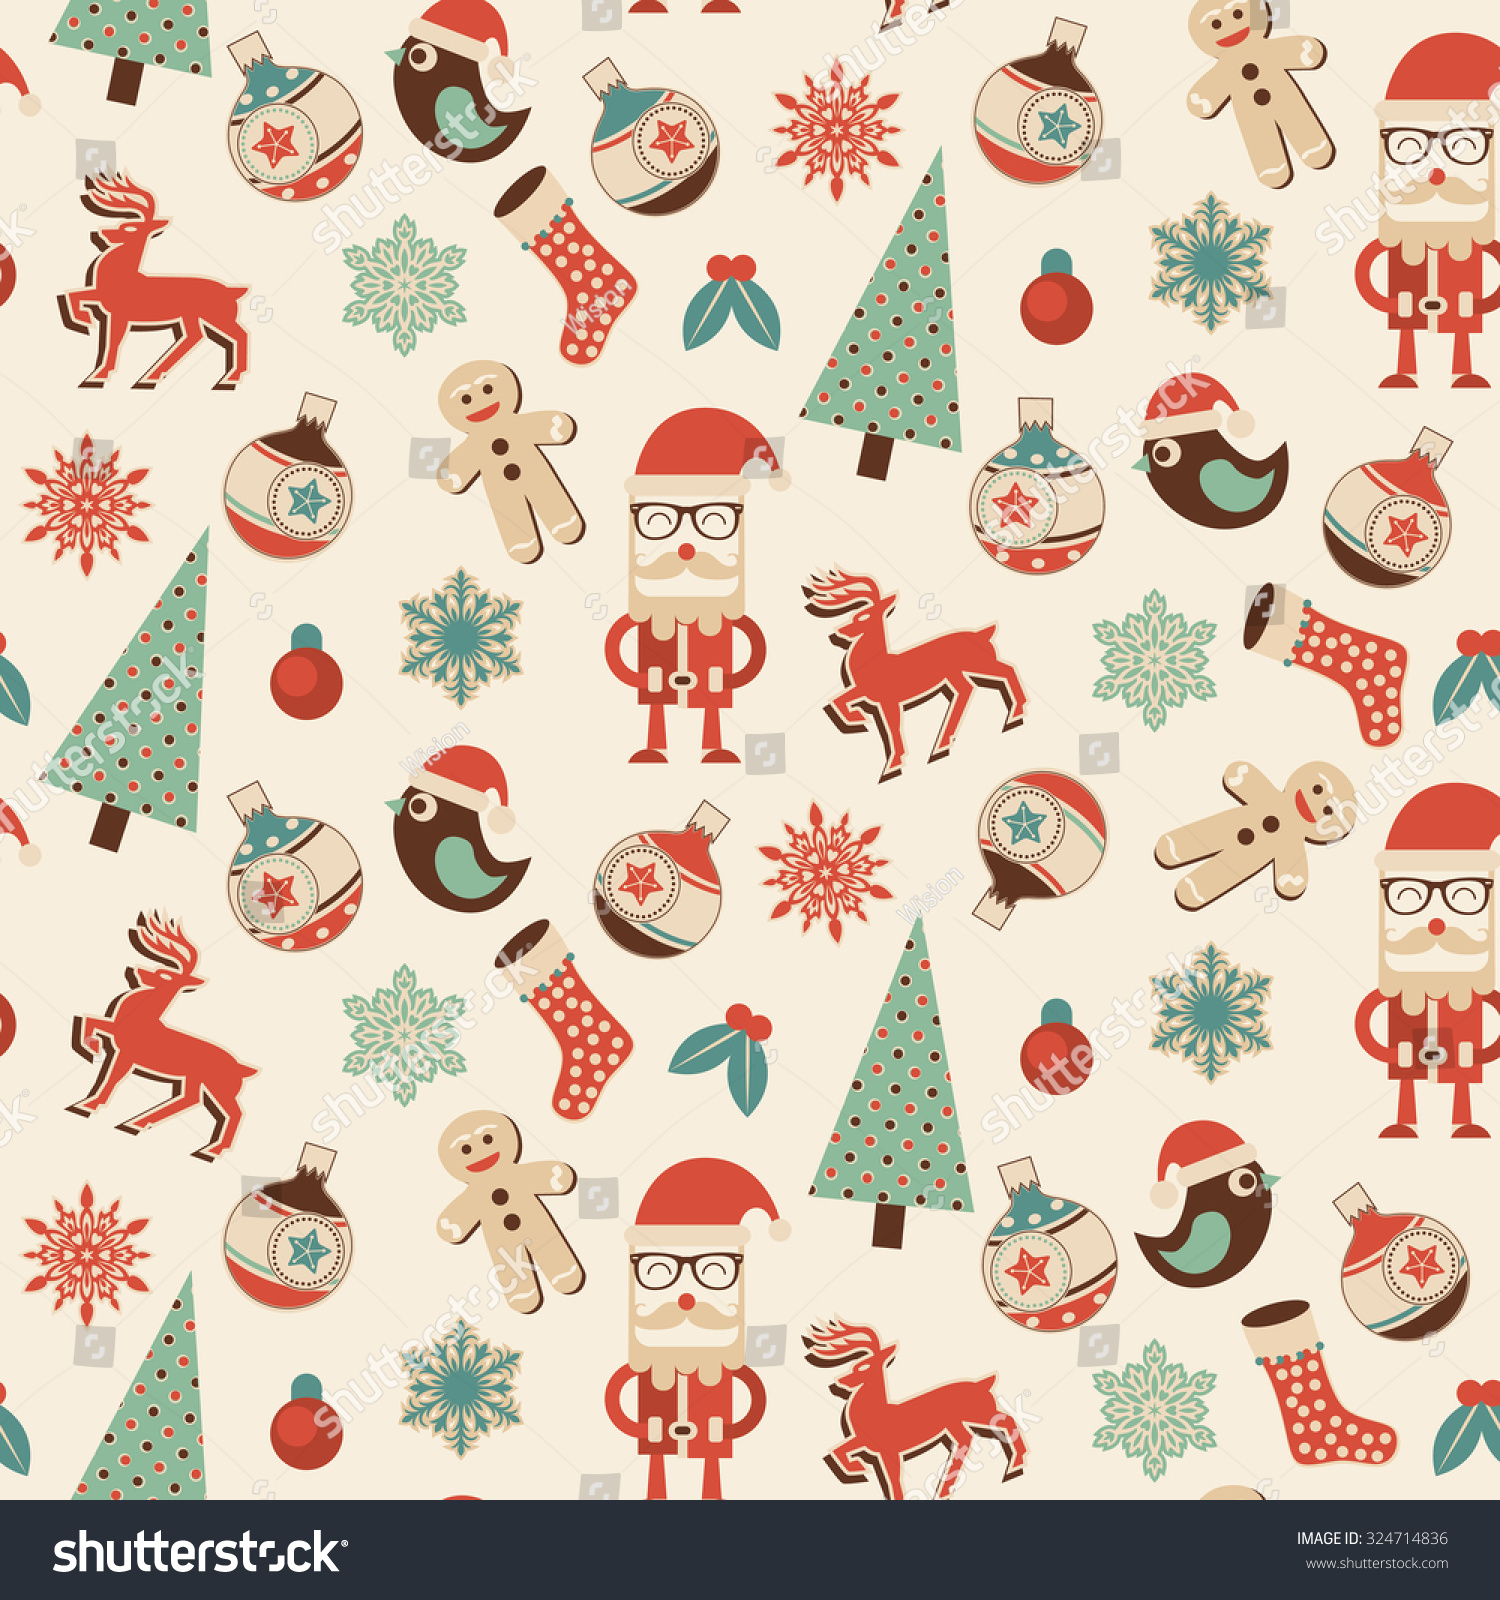 Christmas Gift Wrap Design.Seamless Christmas Pattern Ideal Design Gift Stock Vector